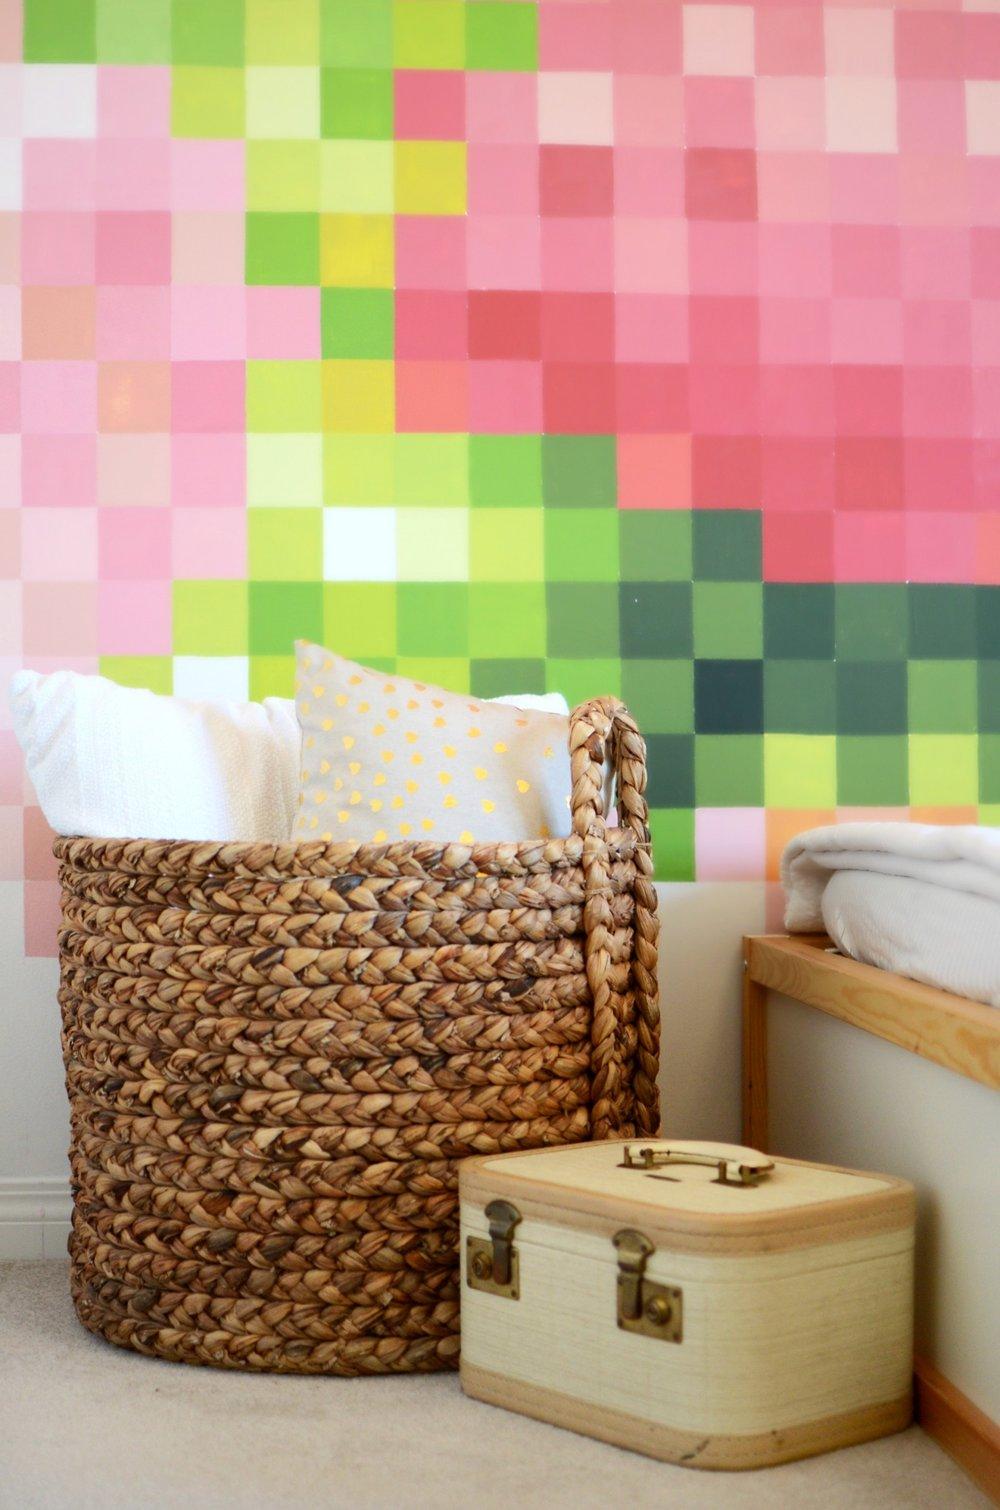 calgary-interior-designer-girls-bedroom-colourful-mural-storage.jpg